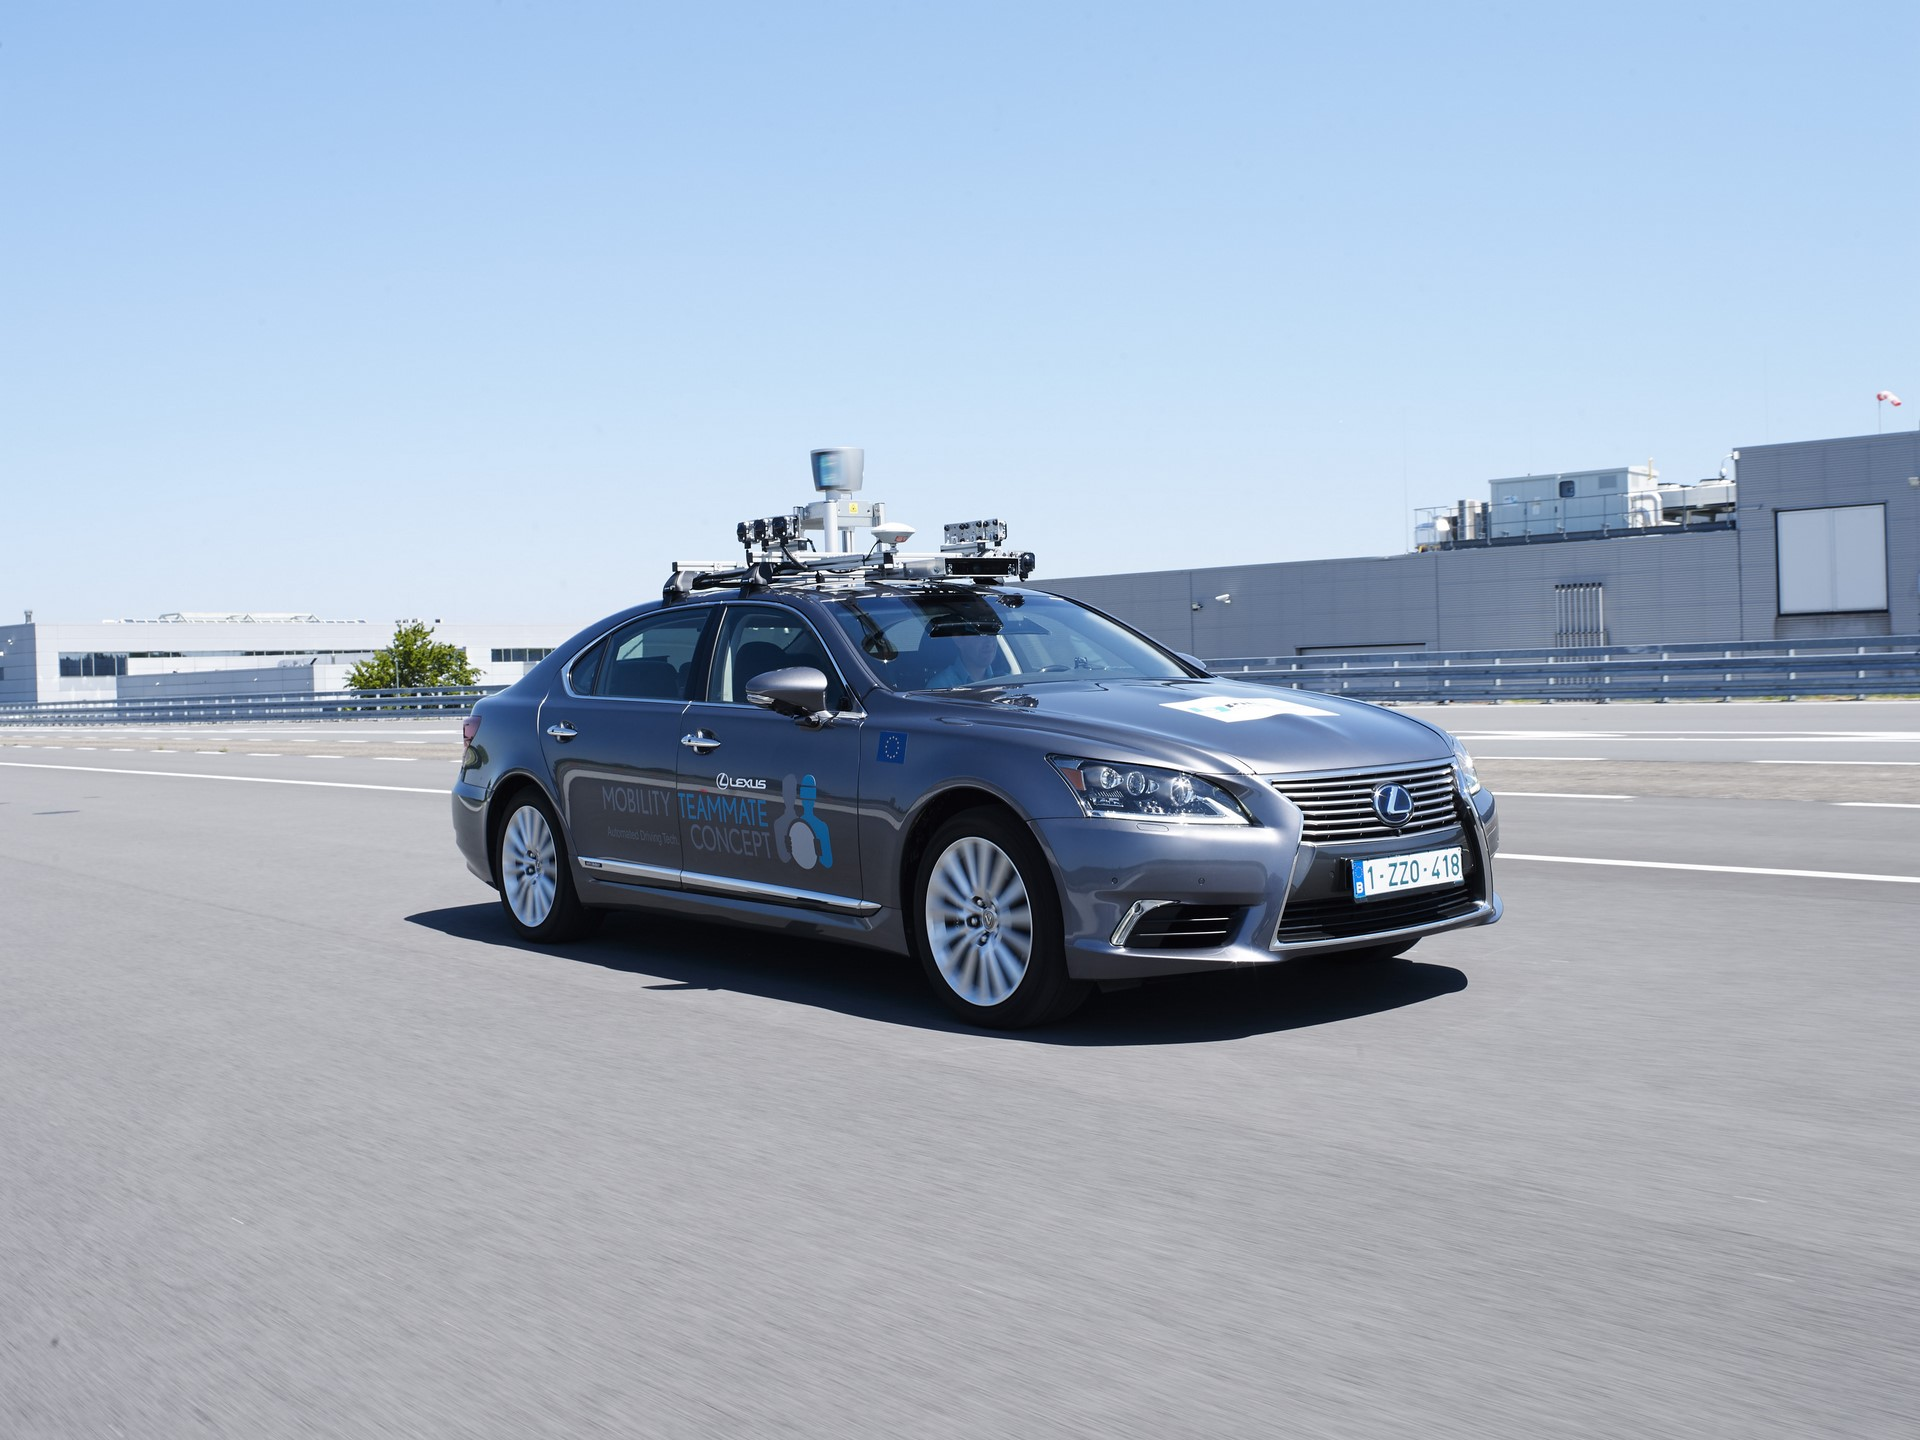 Toyota-Autonomous-Europe-Lexus-LS-12